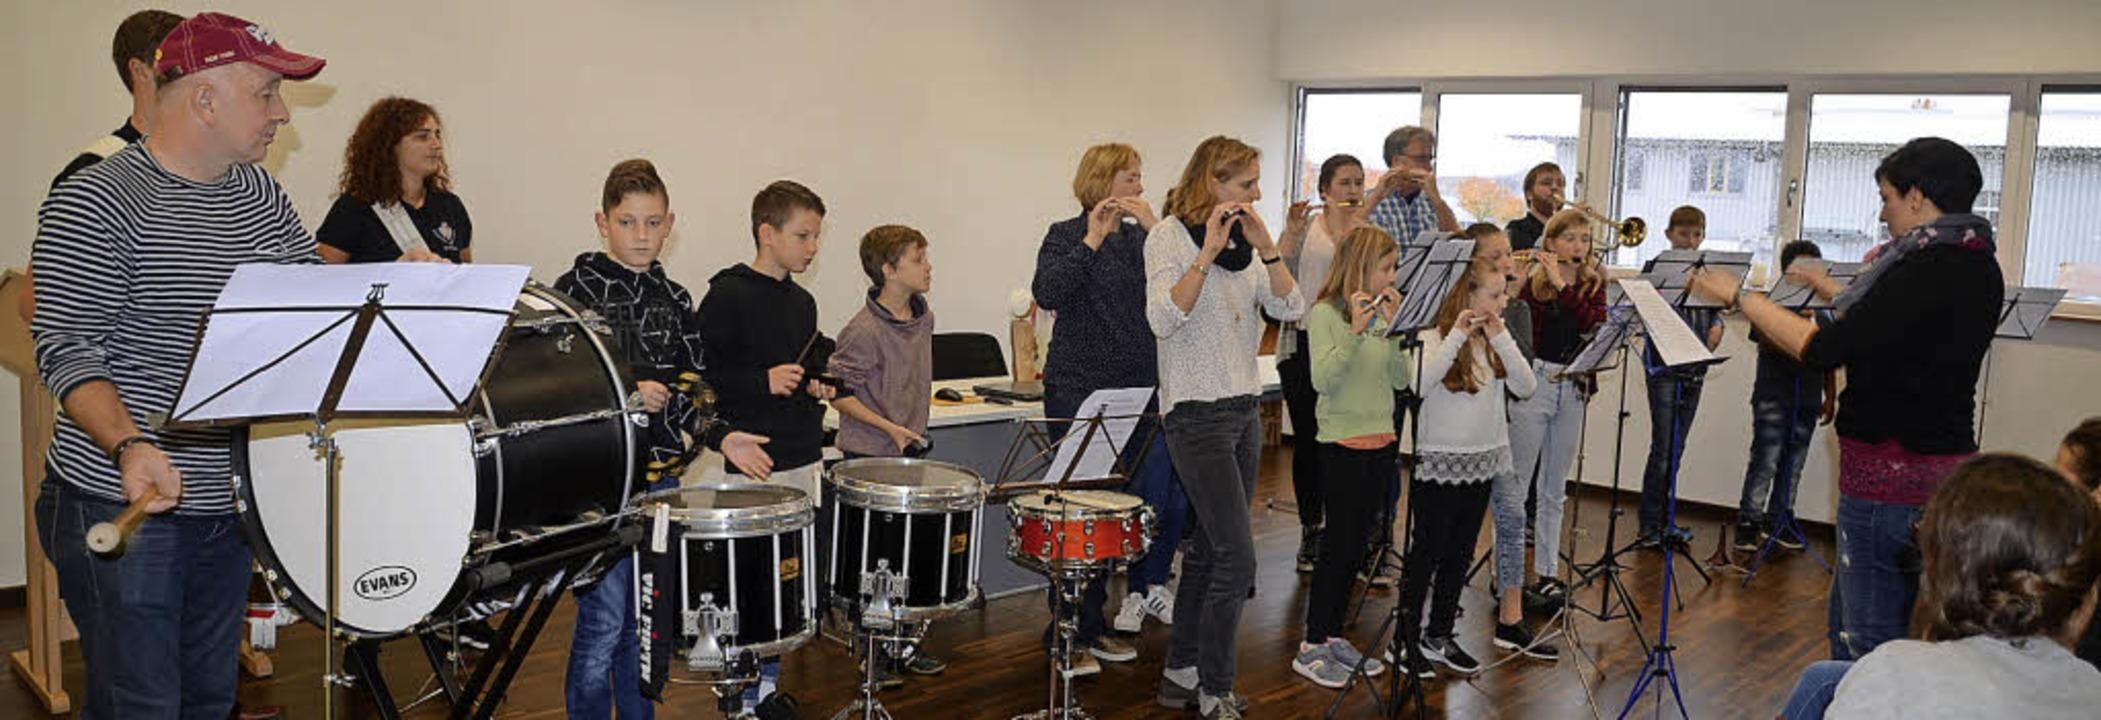 Endingen. Die Jungmusiker beim gemeinsamen Abschlussstück.    Foto: Roland Vitt